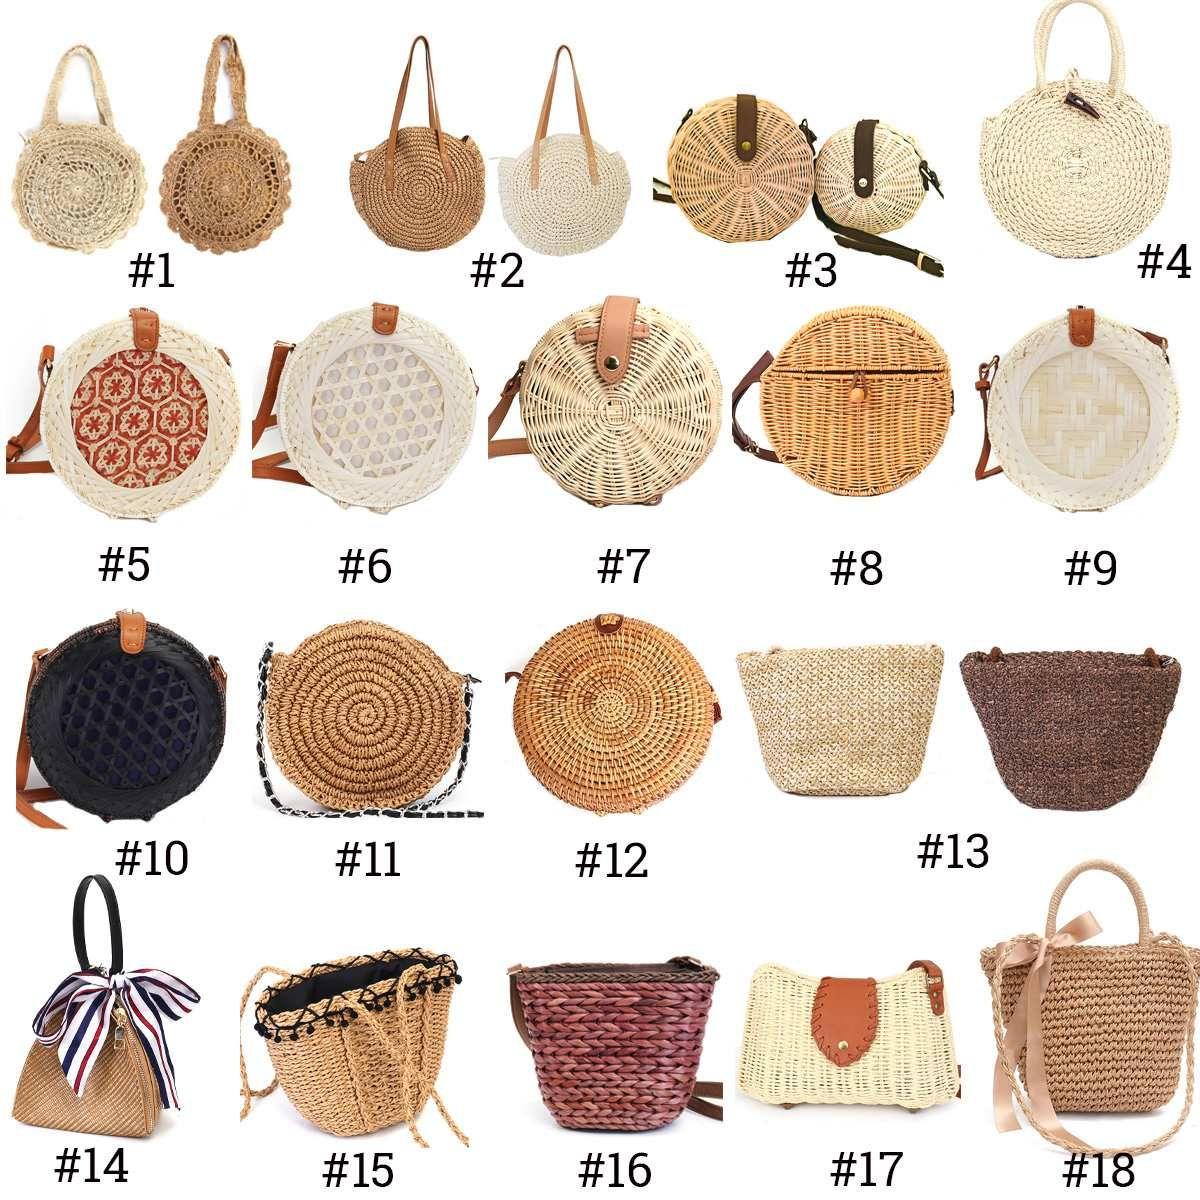 Beach Straw Bags for Women 2019 Summer Rattan Bag Handmade Woven Beach Bag Bohem